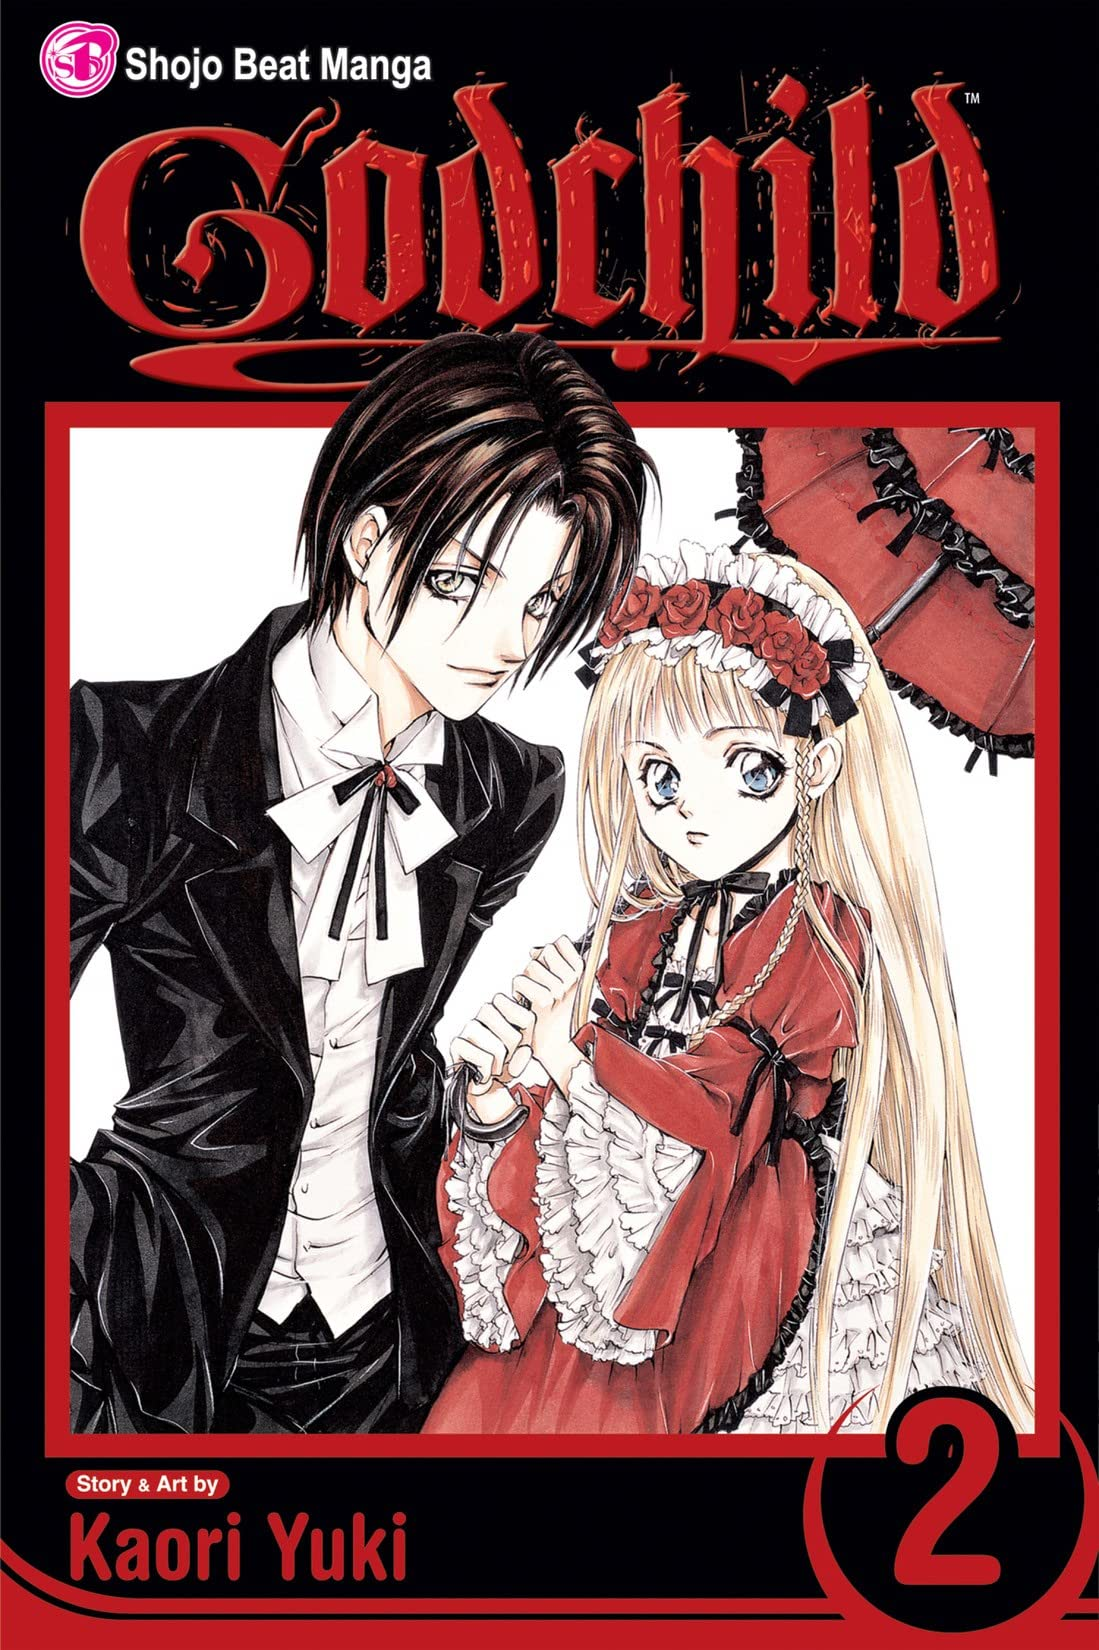 Godchild Vol. 2